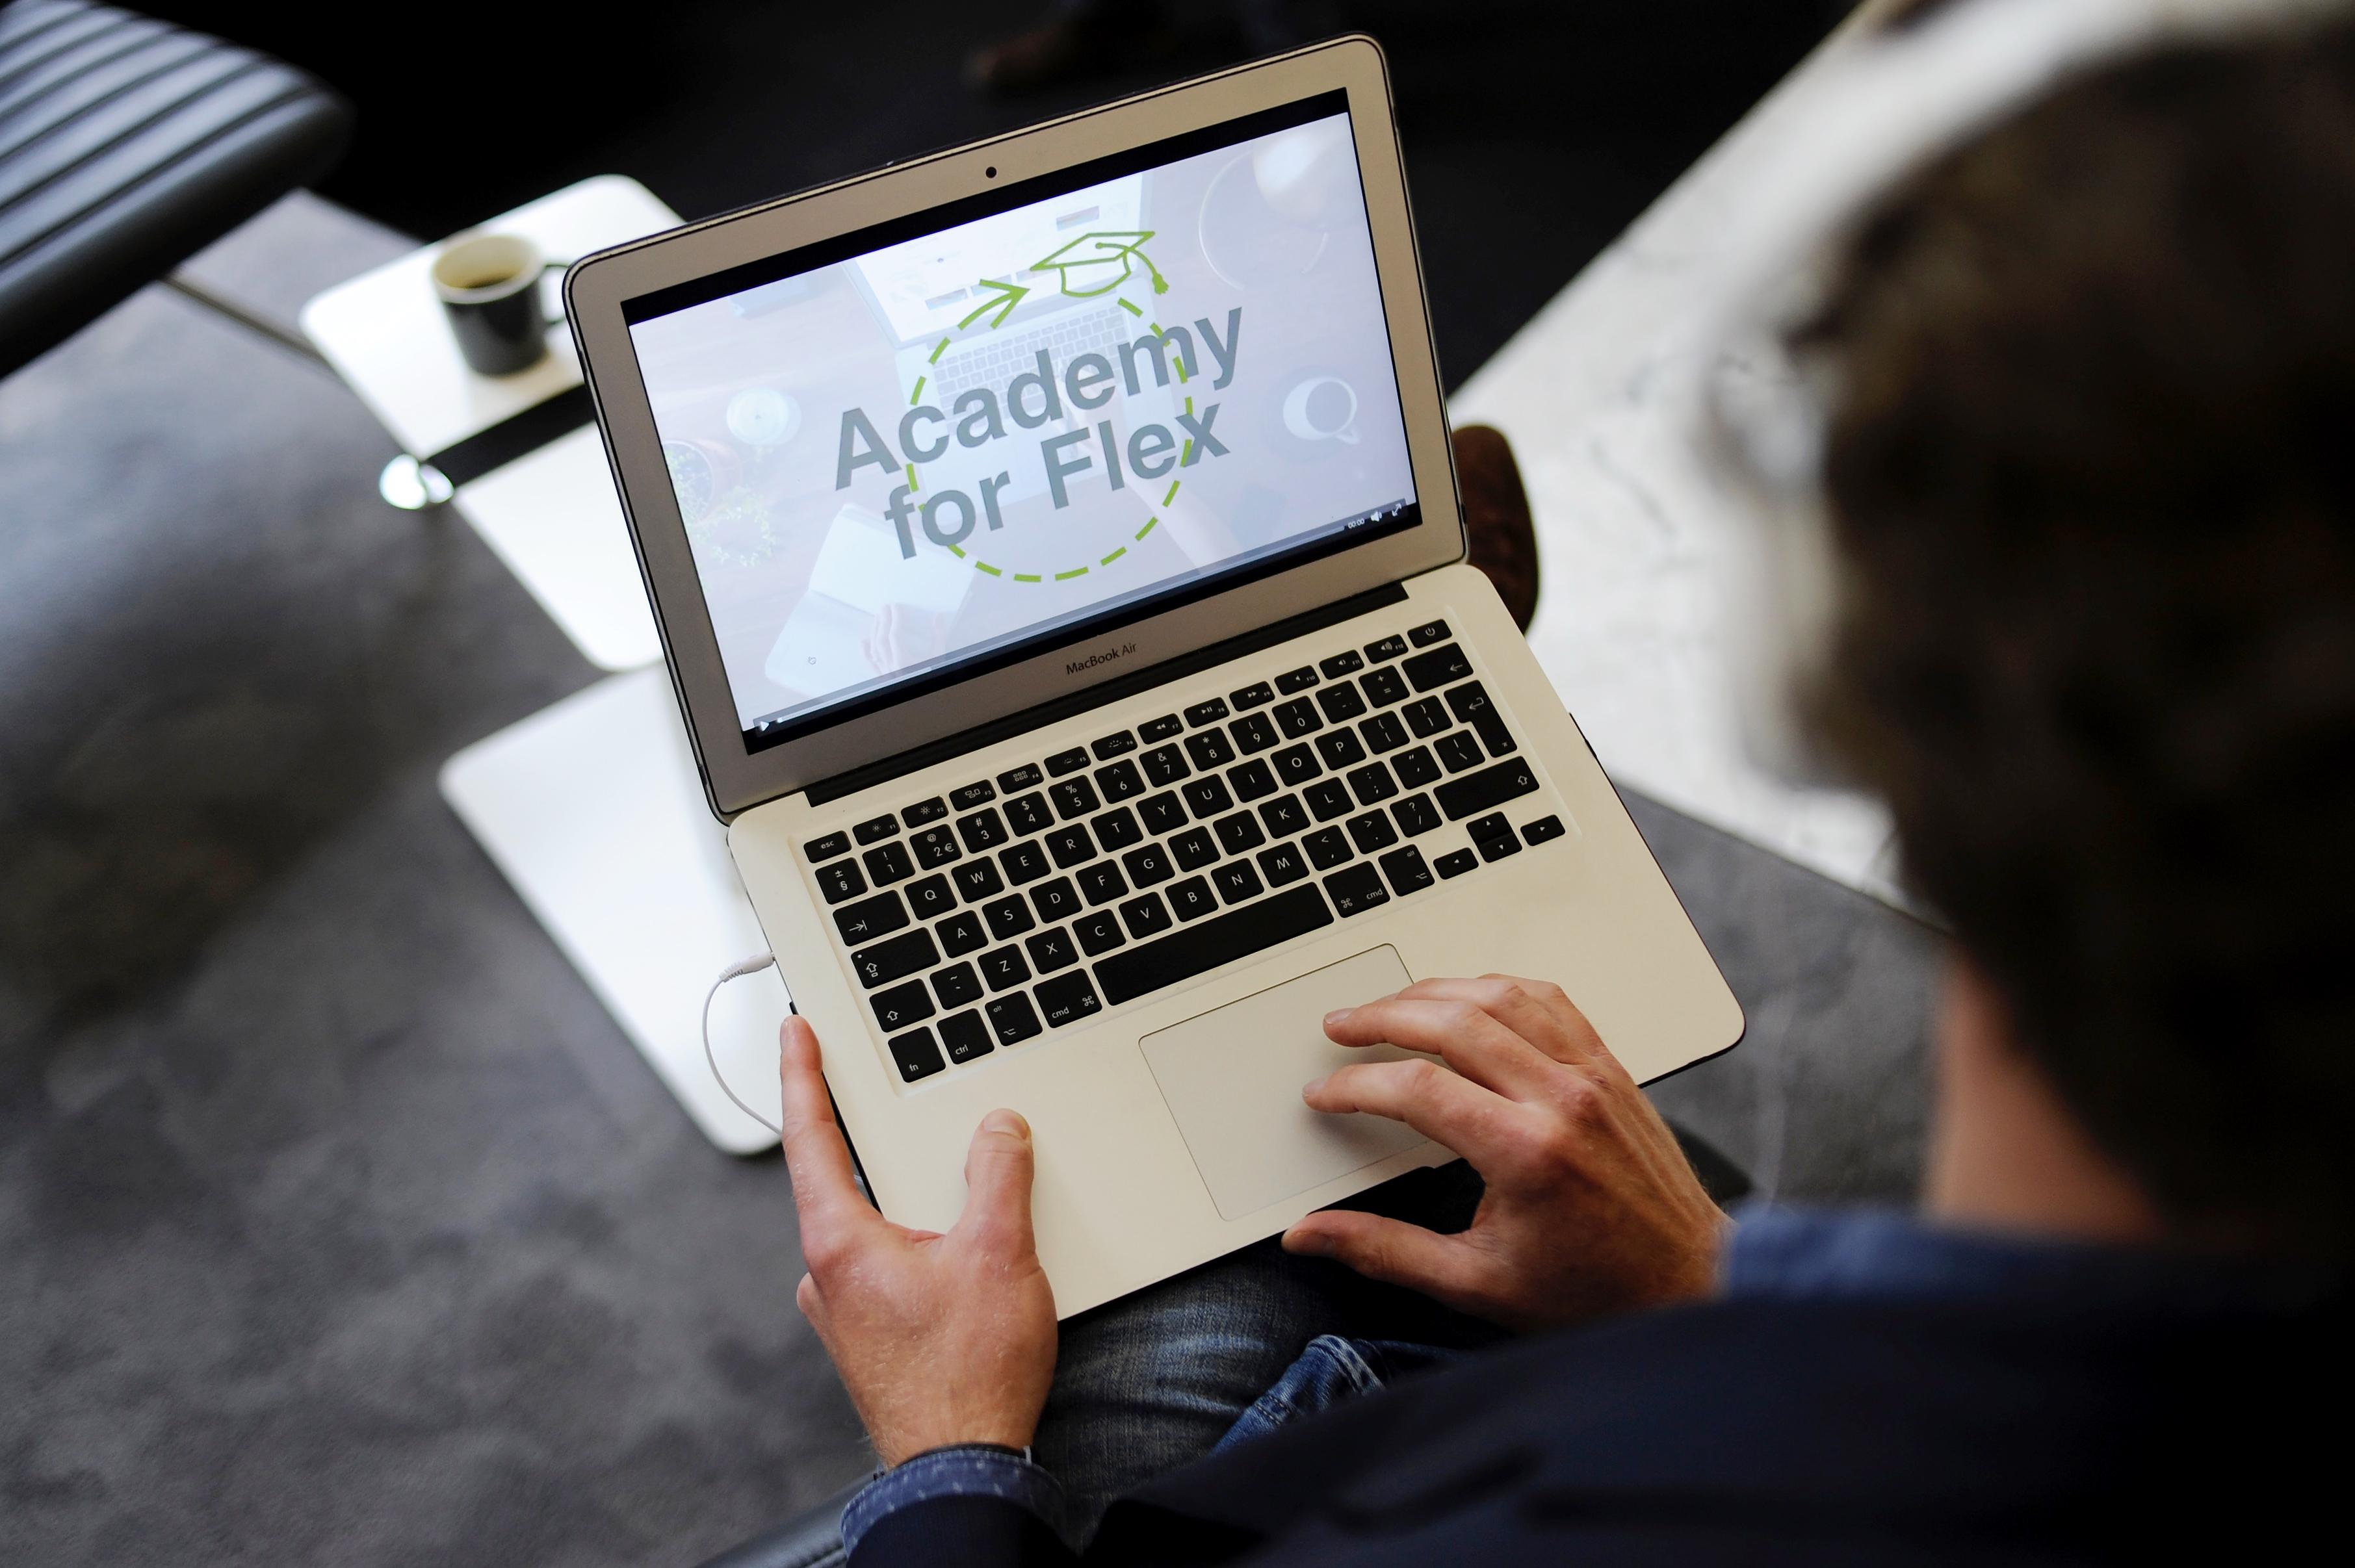 Academy for Flex